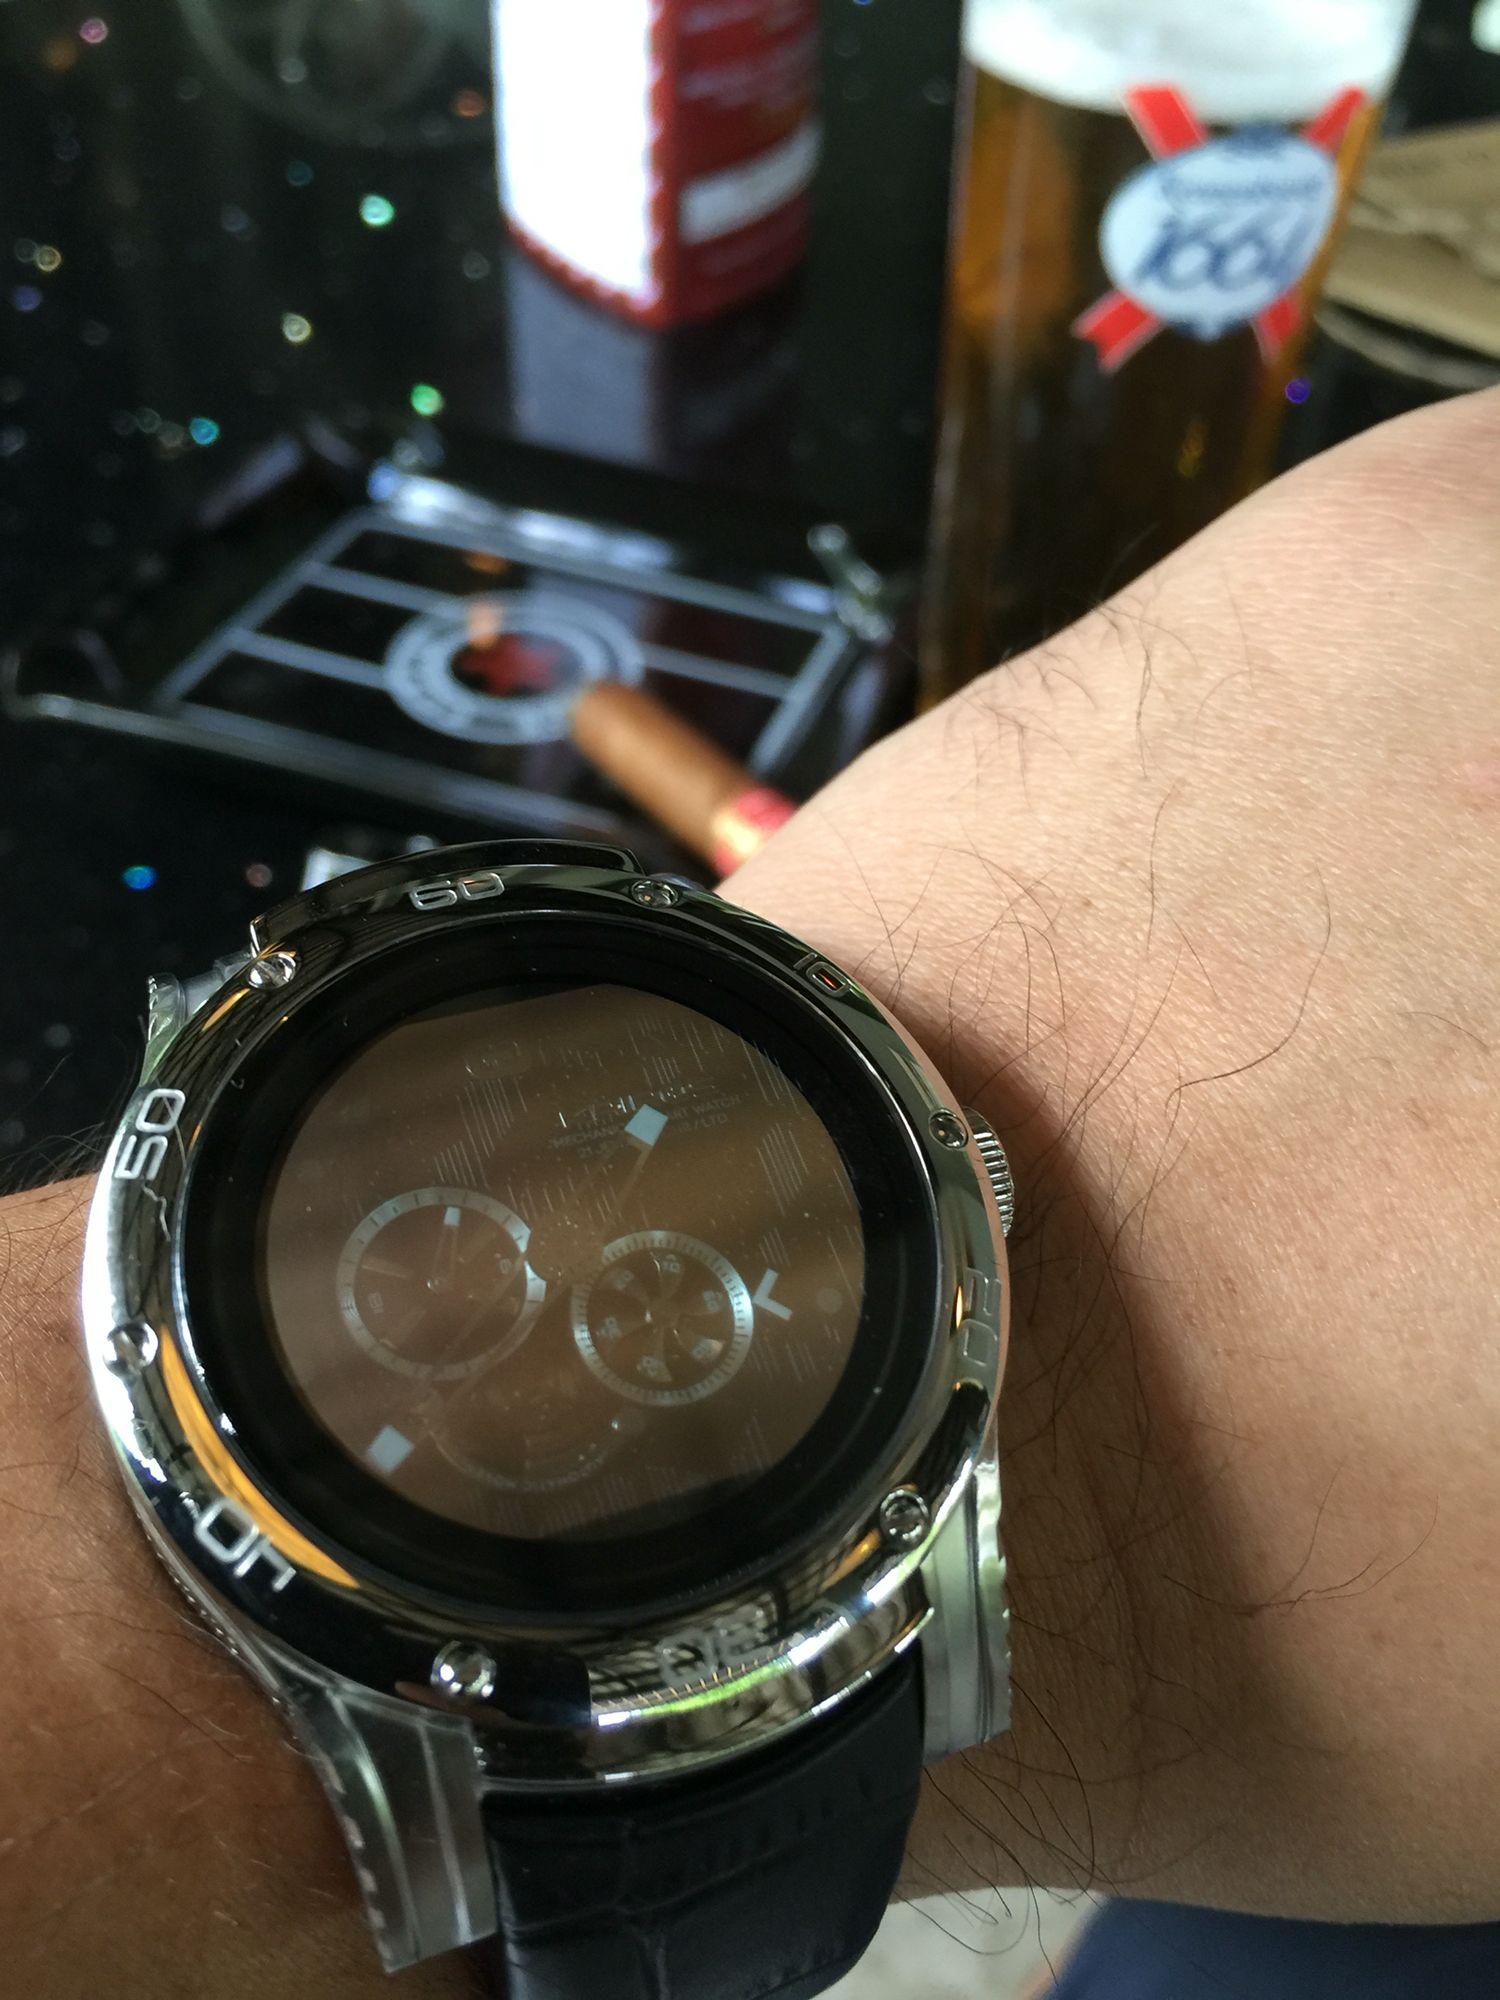 Hybrid mechanical smart watch